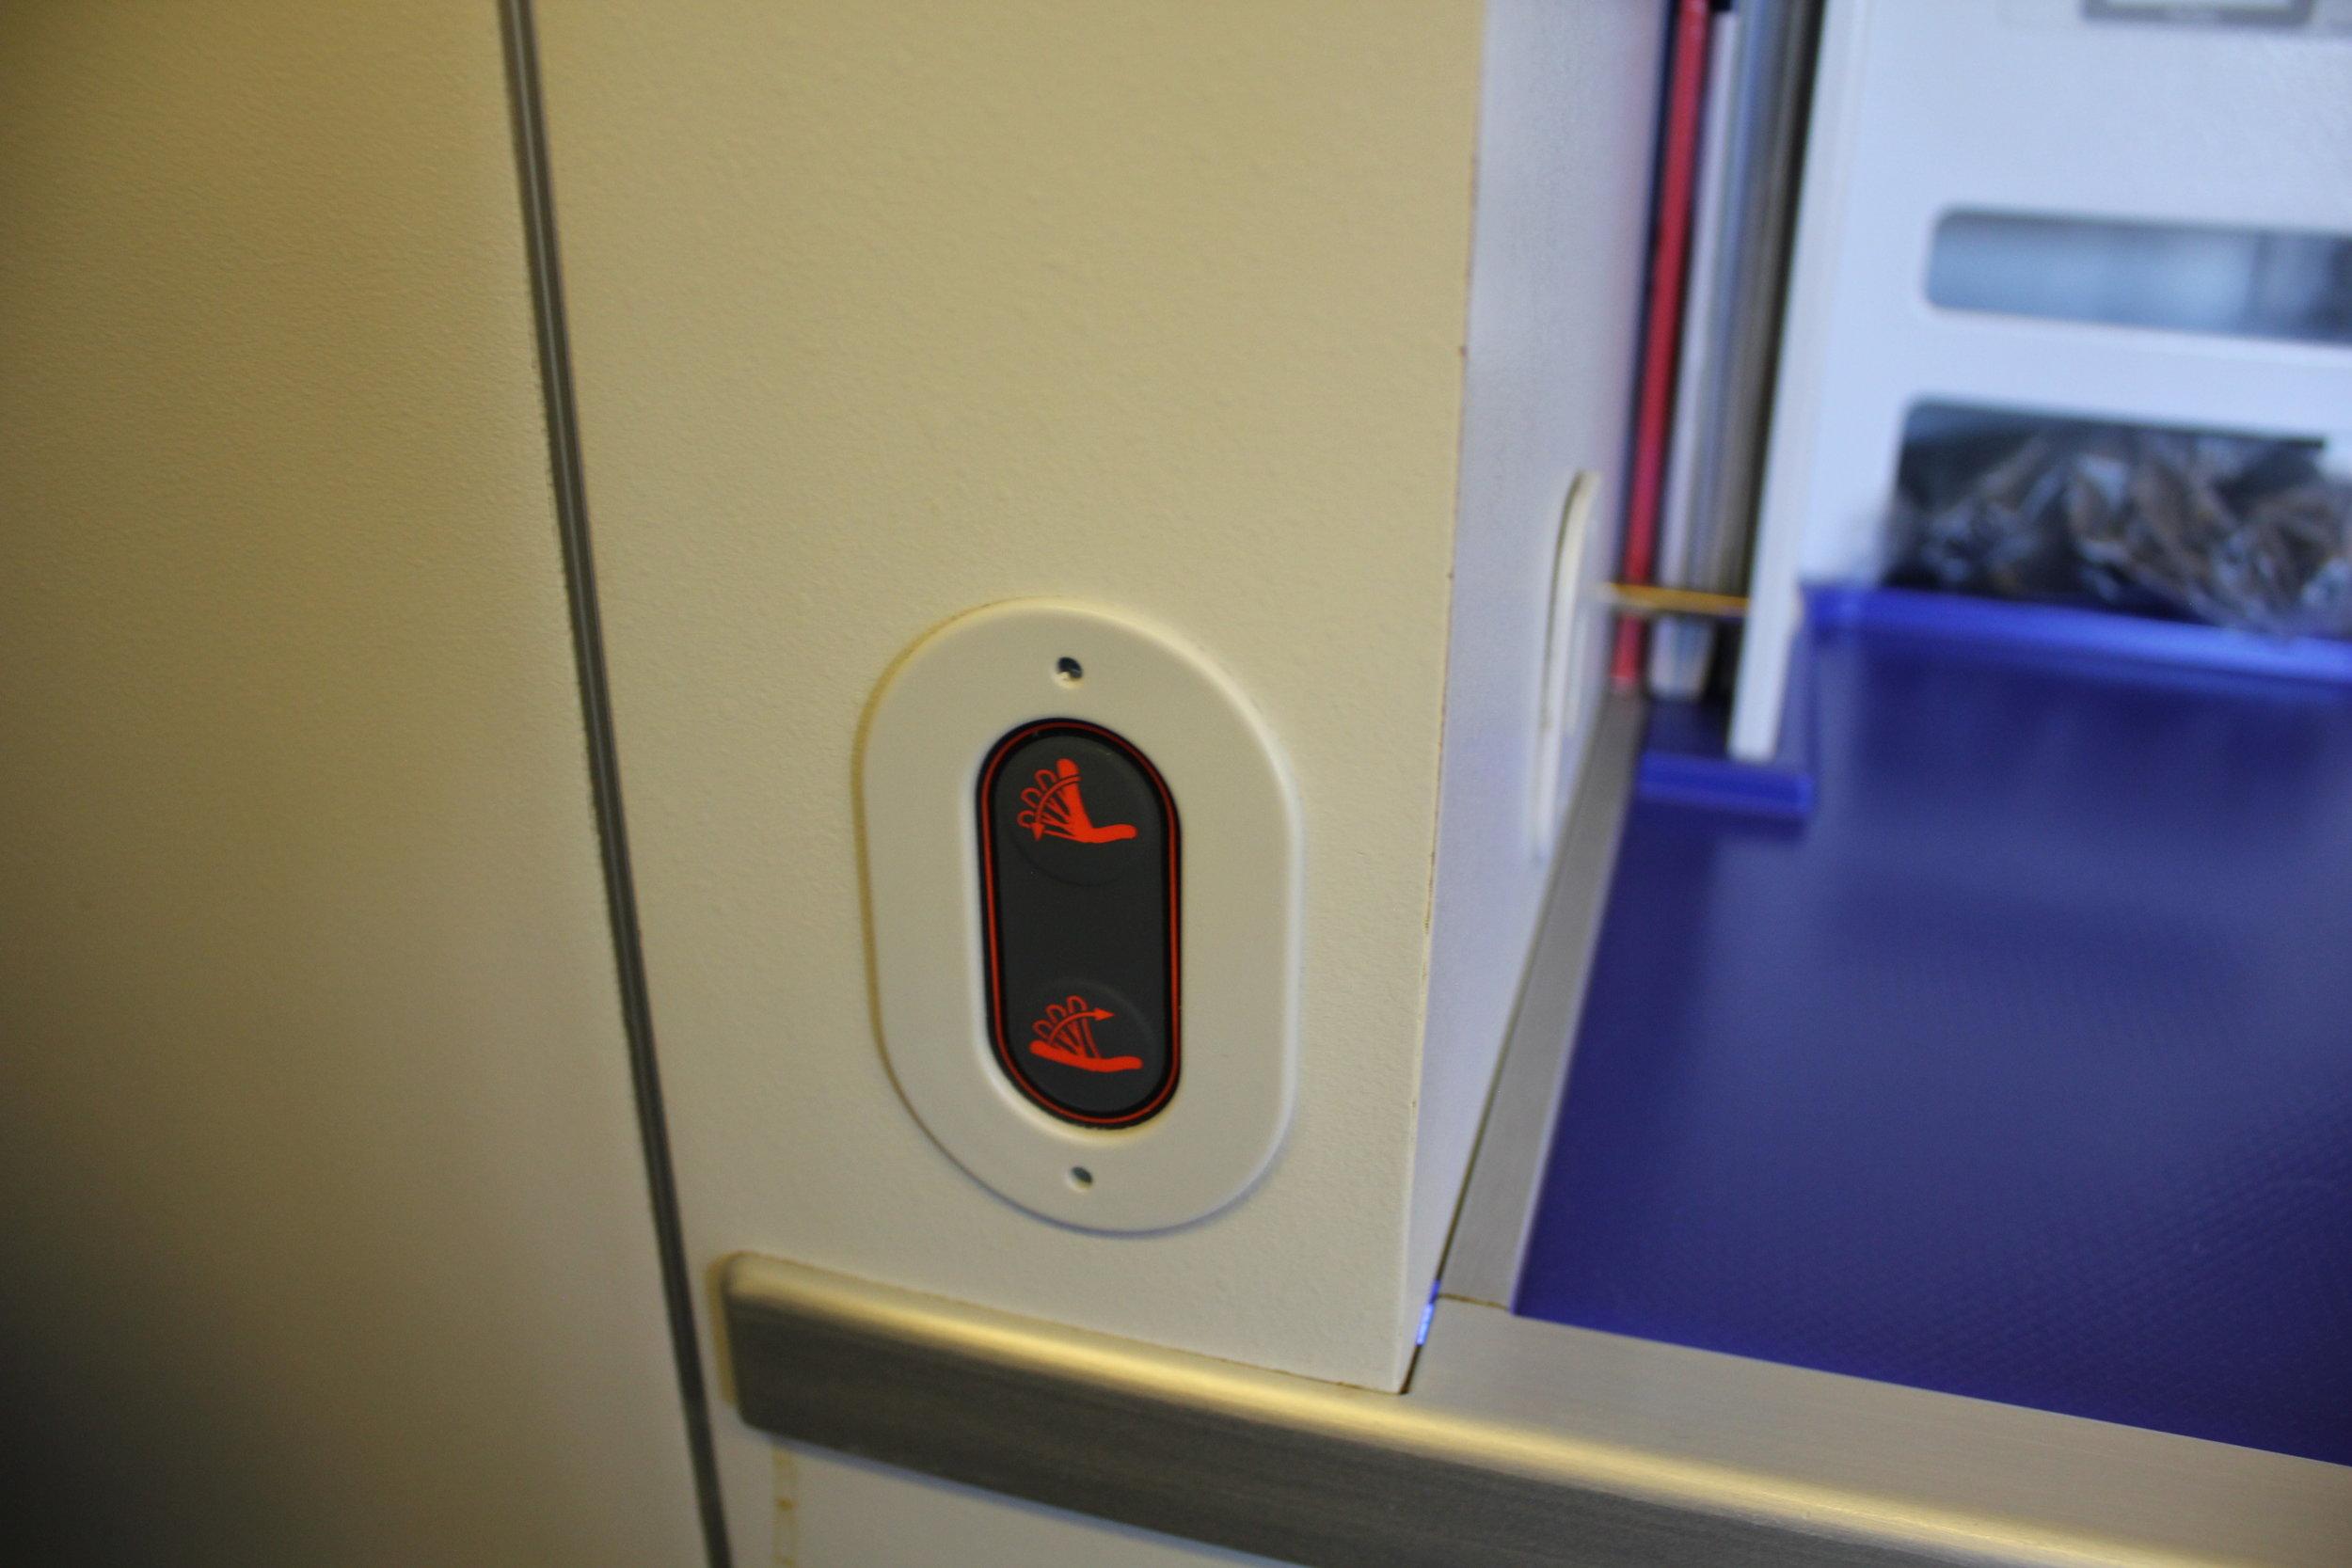 ANA 777 business class – Seat back controls